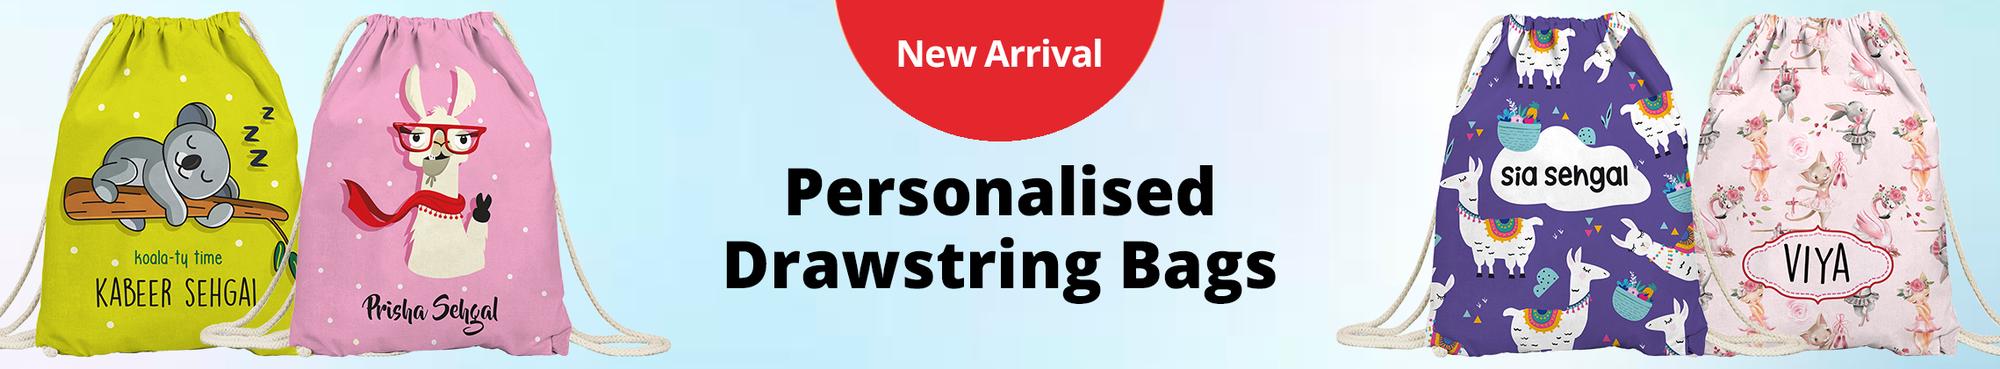 Personalised Drawstring Bags